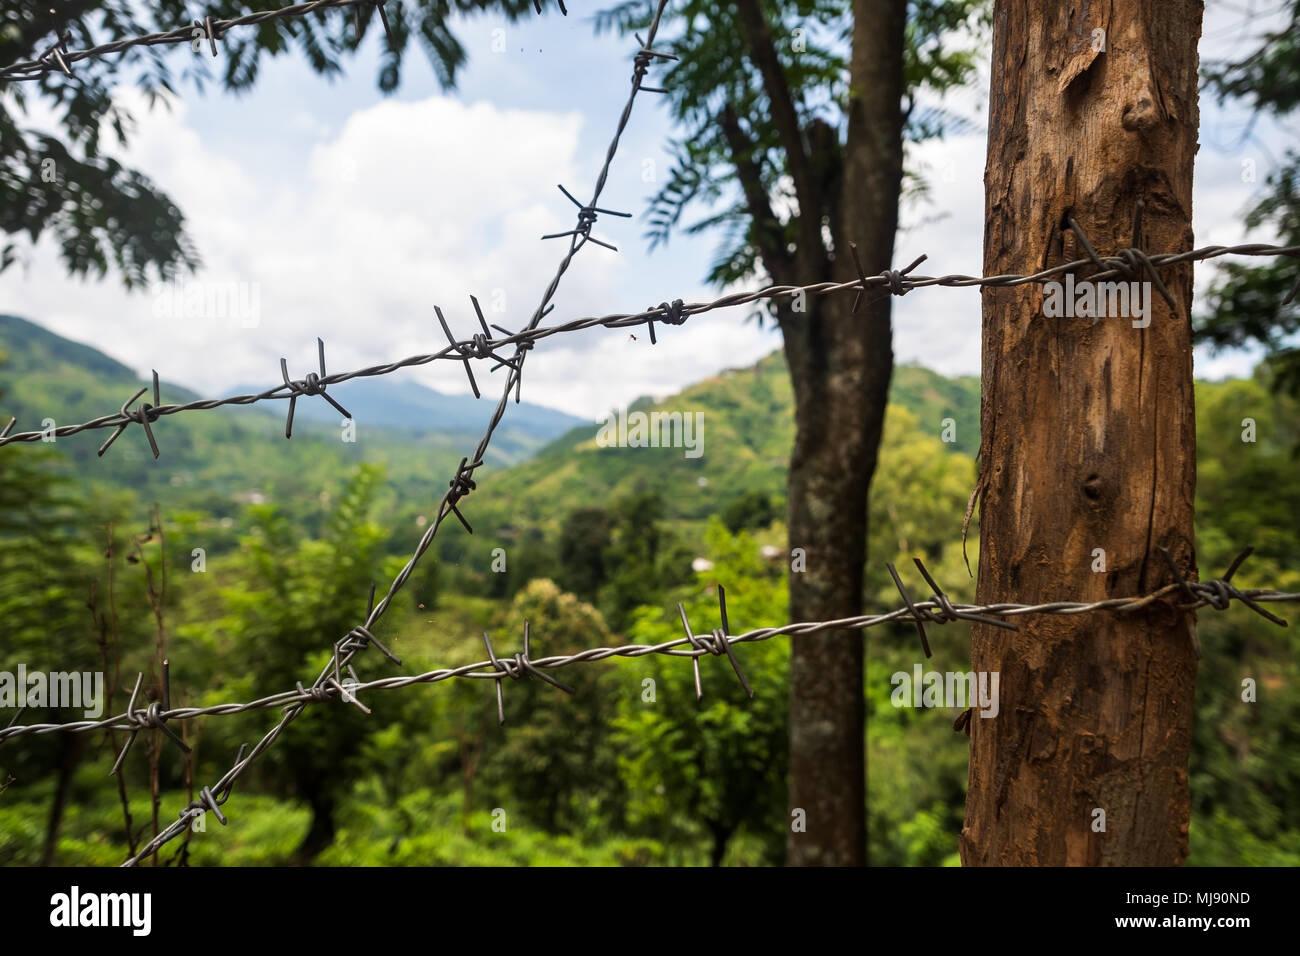 Marking Border Of Farm Land. Bad Influence On Nature